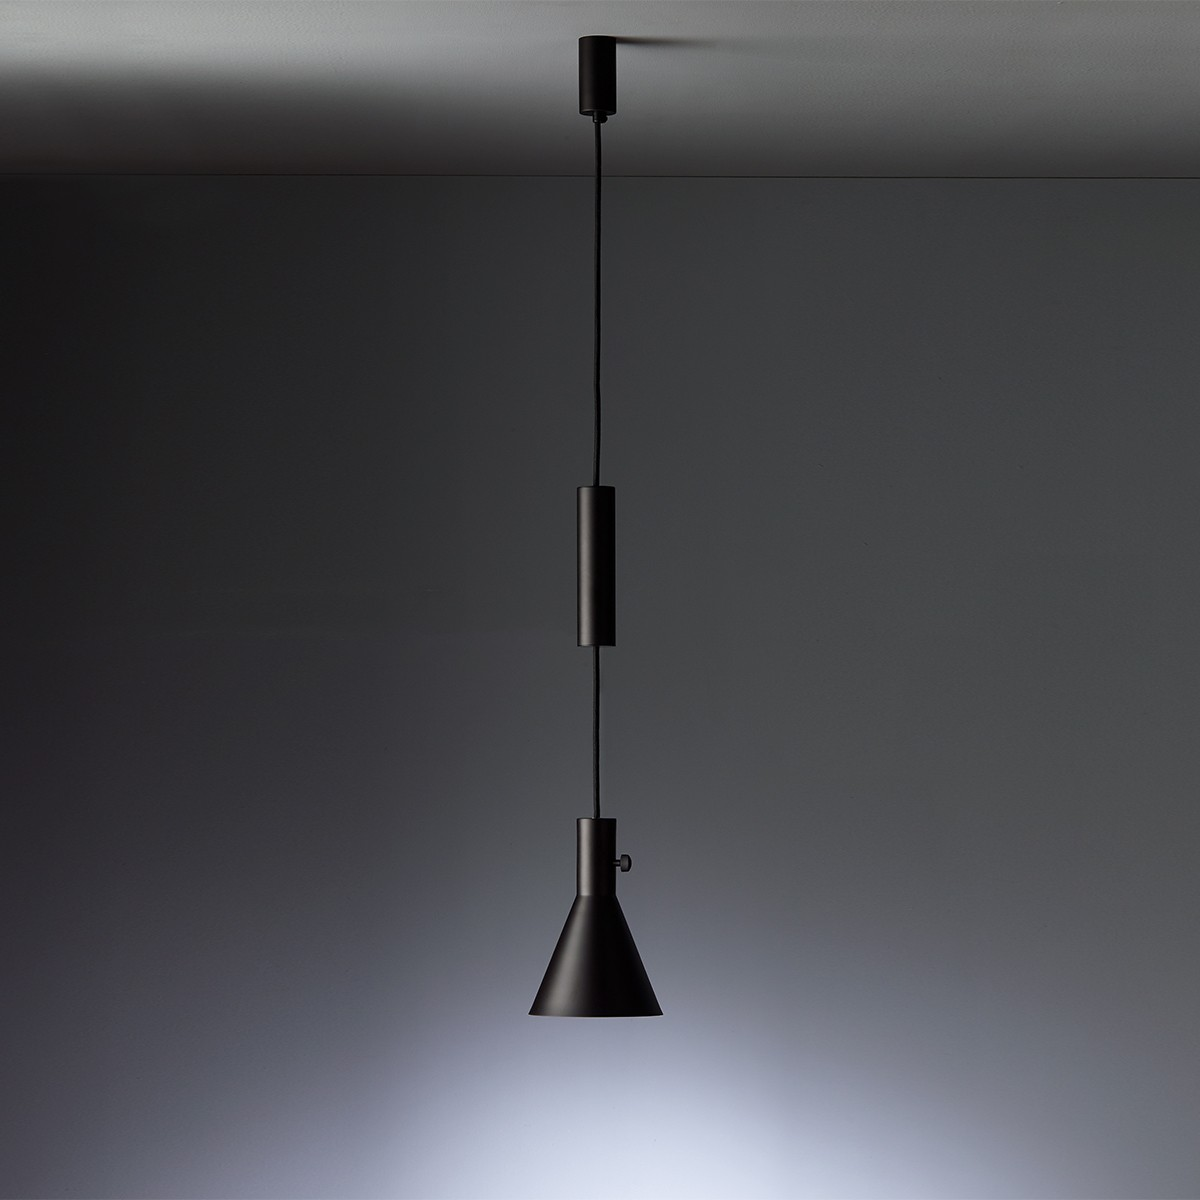 Tecnolumen Eleu Pendelleuchte, schwarz matt lackiert